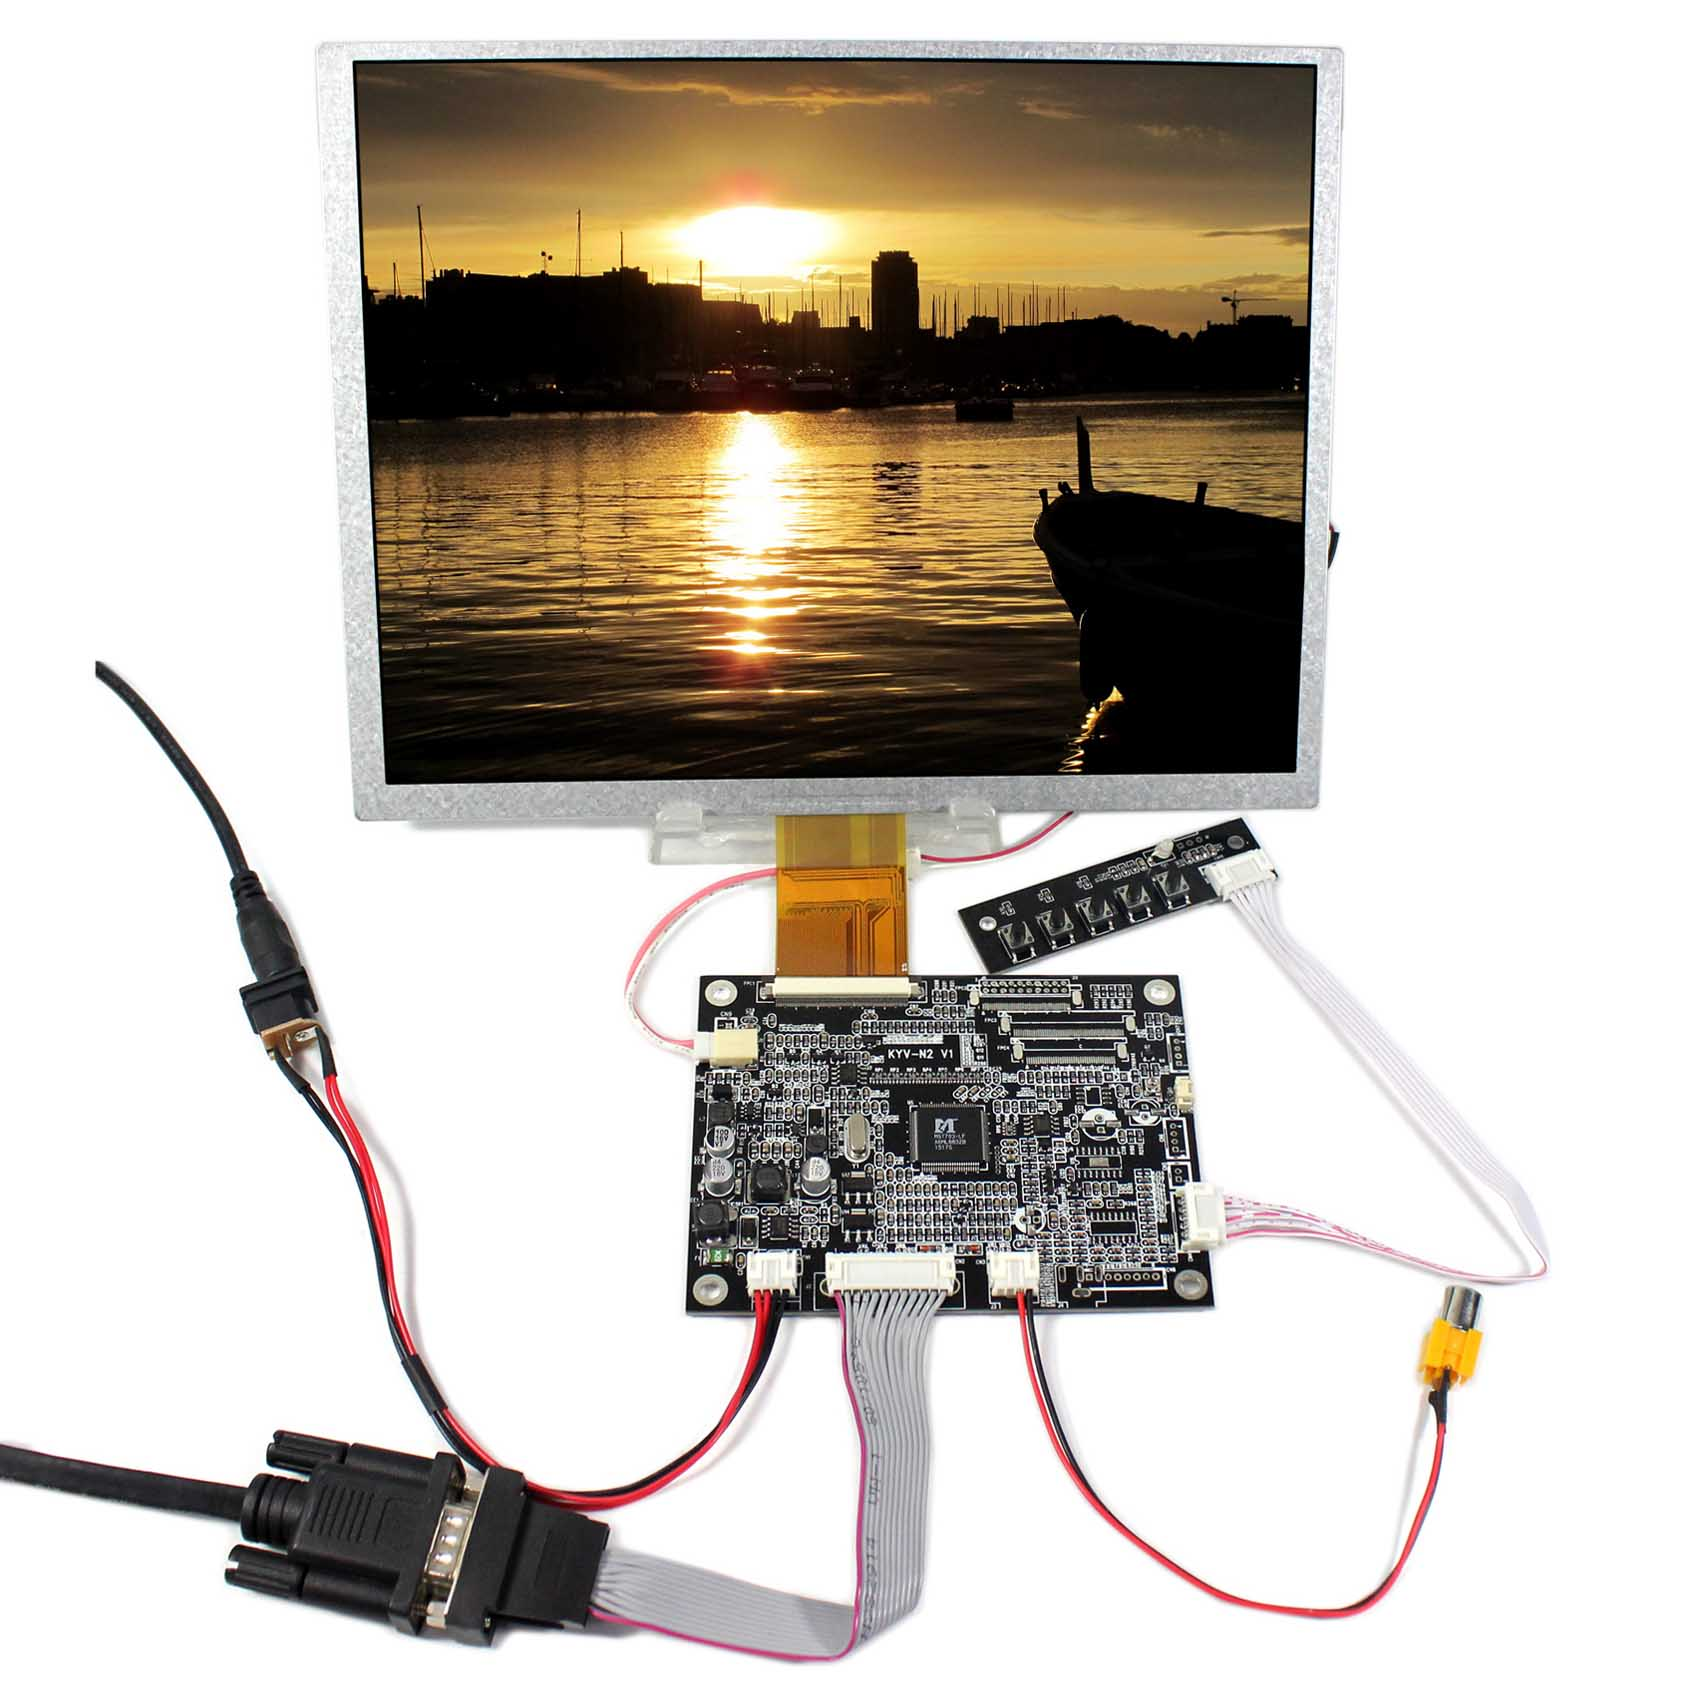 10.4inch 800x600 LSA40AT9001 LCD Replace A104SN03+VGA AV LCD Controller Board KYV-N2 V1 8inch zj080na 08a 1024x600 resistive touch lcd screen vga 2av reversing lcd controller board kyv n2 v1